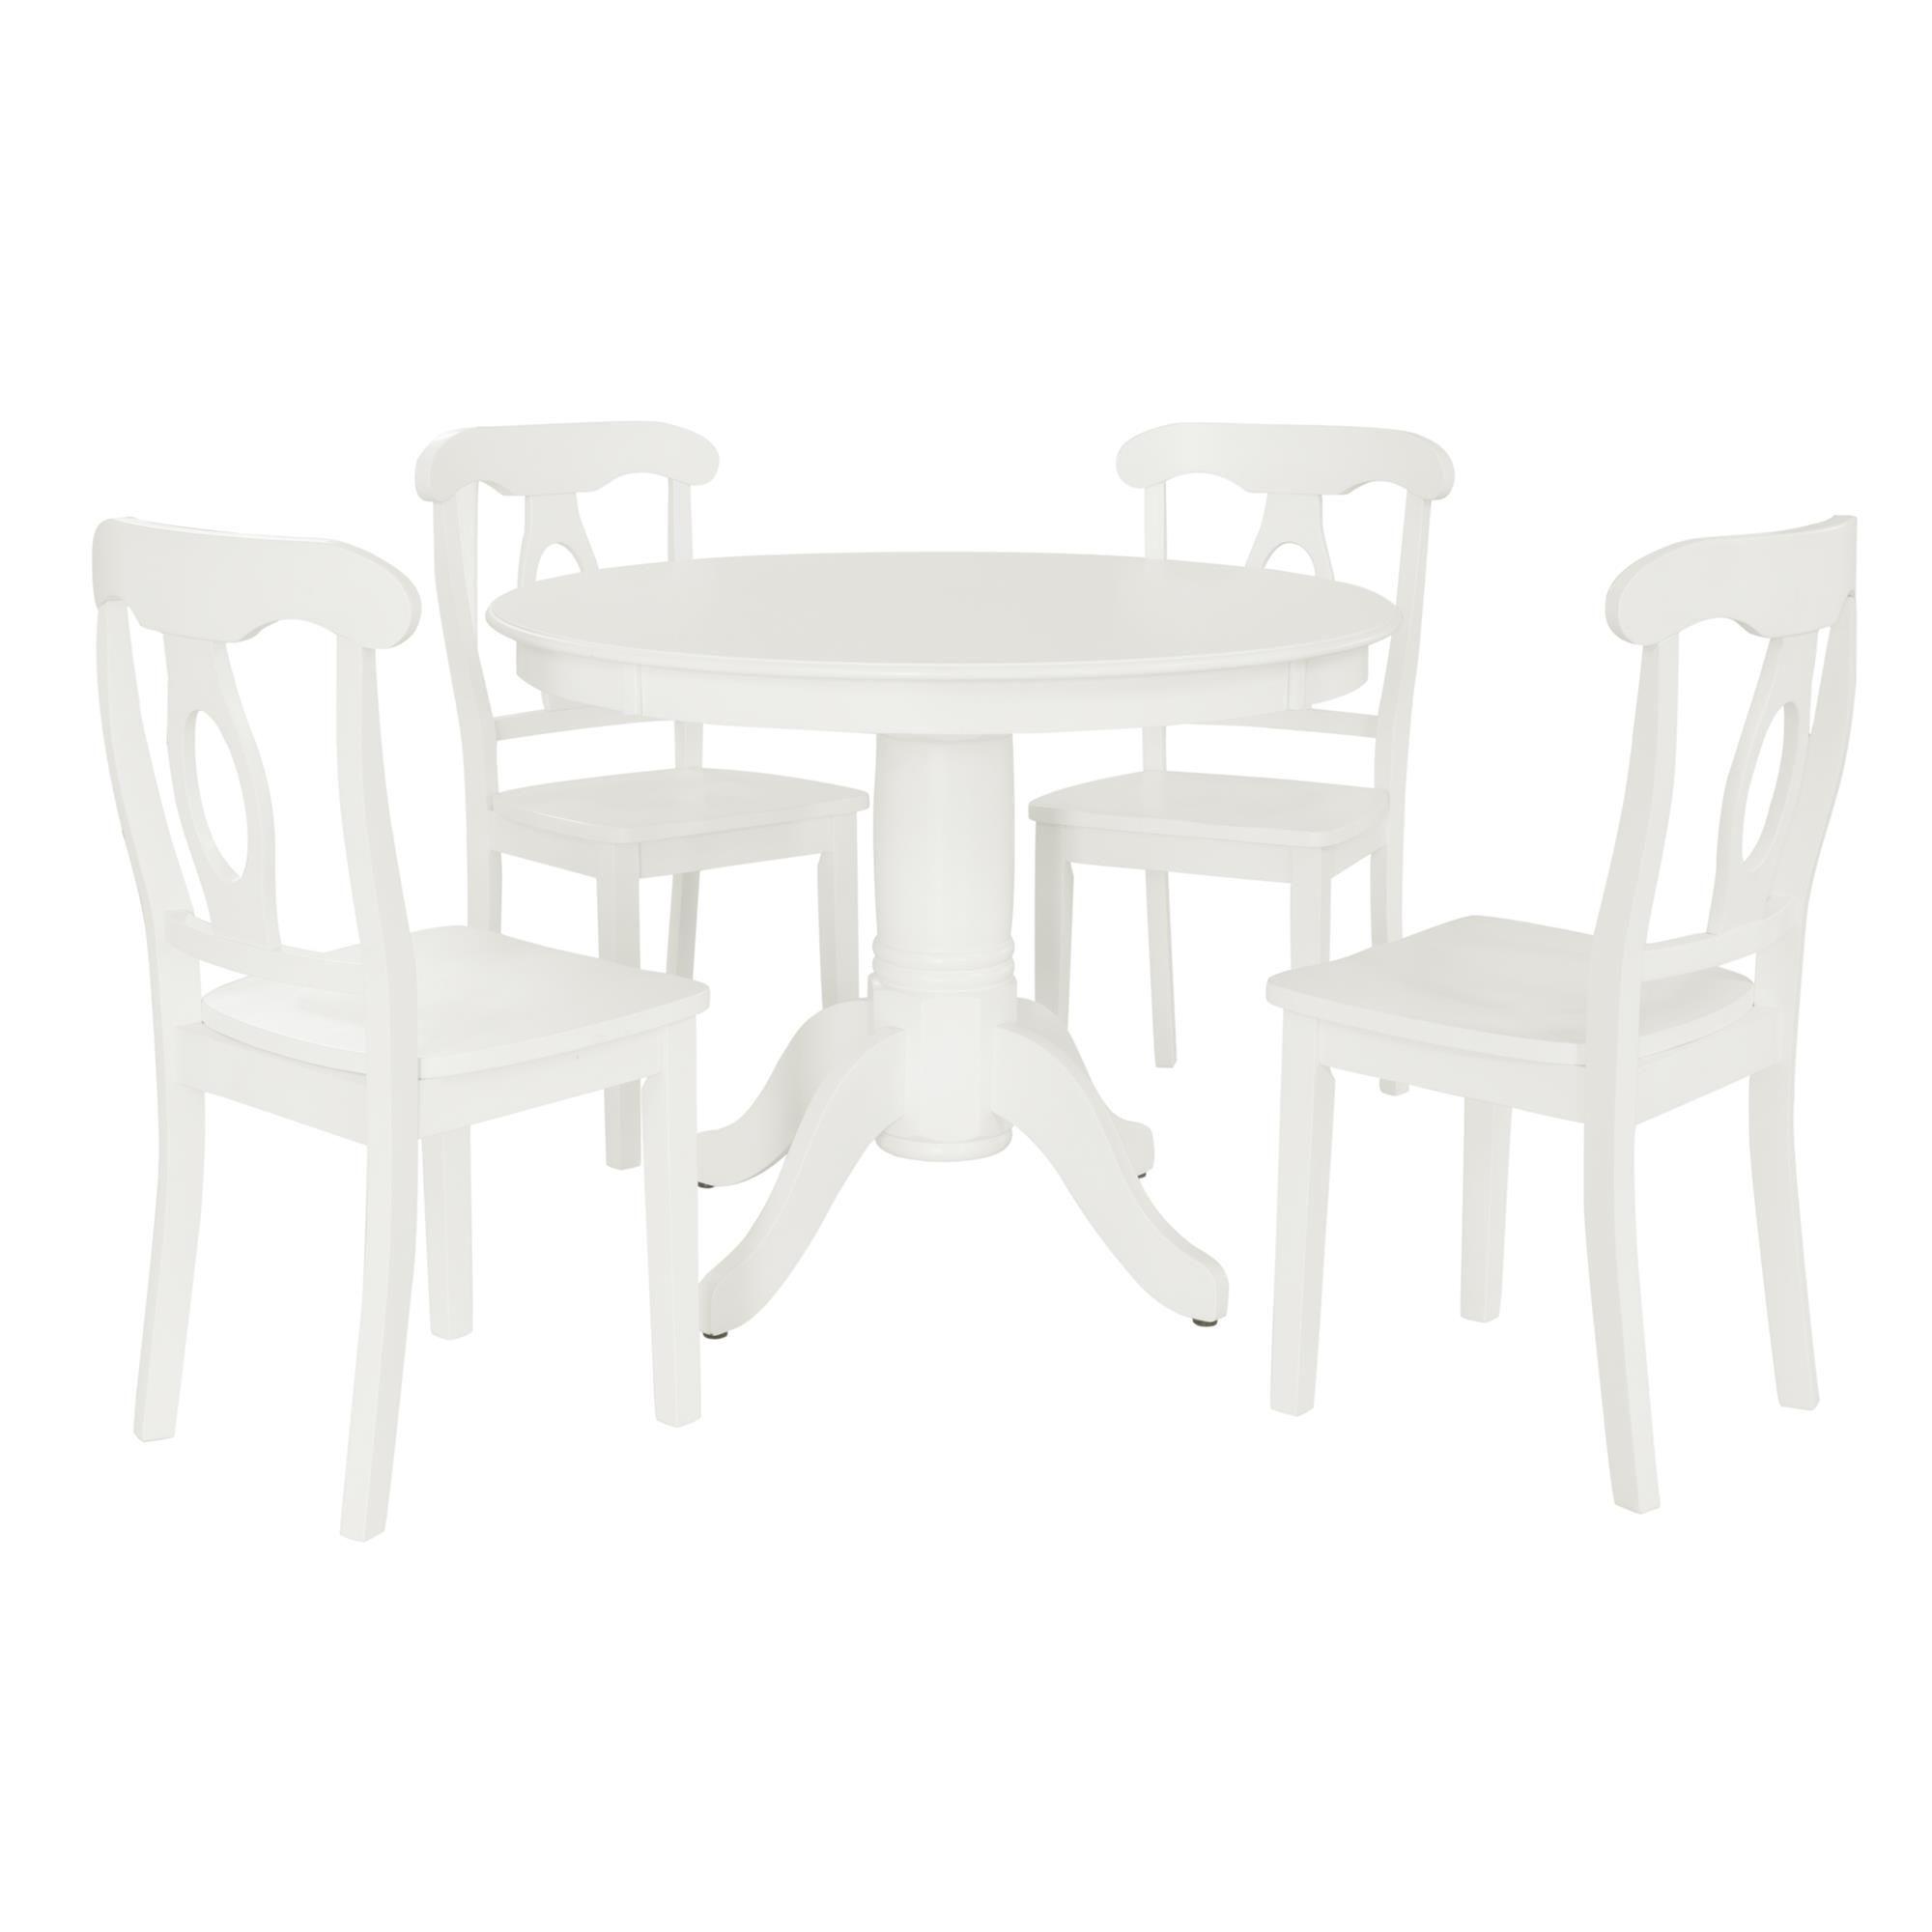 28+ Dorel home aubrey 5 piece traditional height pedestal dining set Best